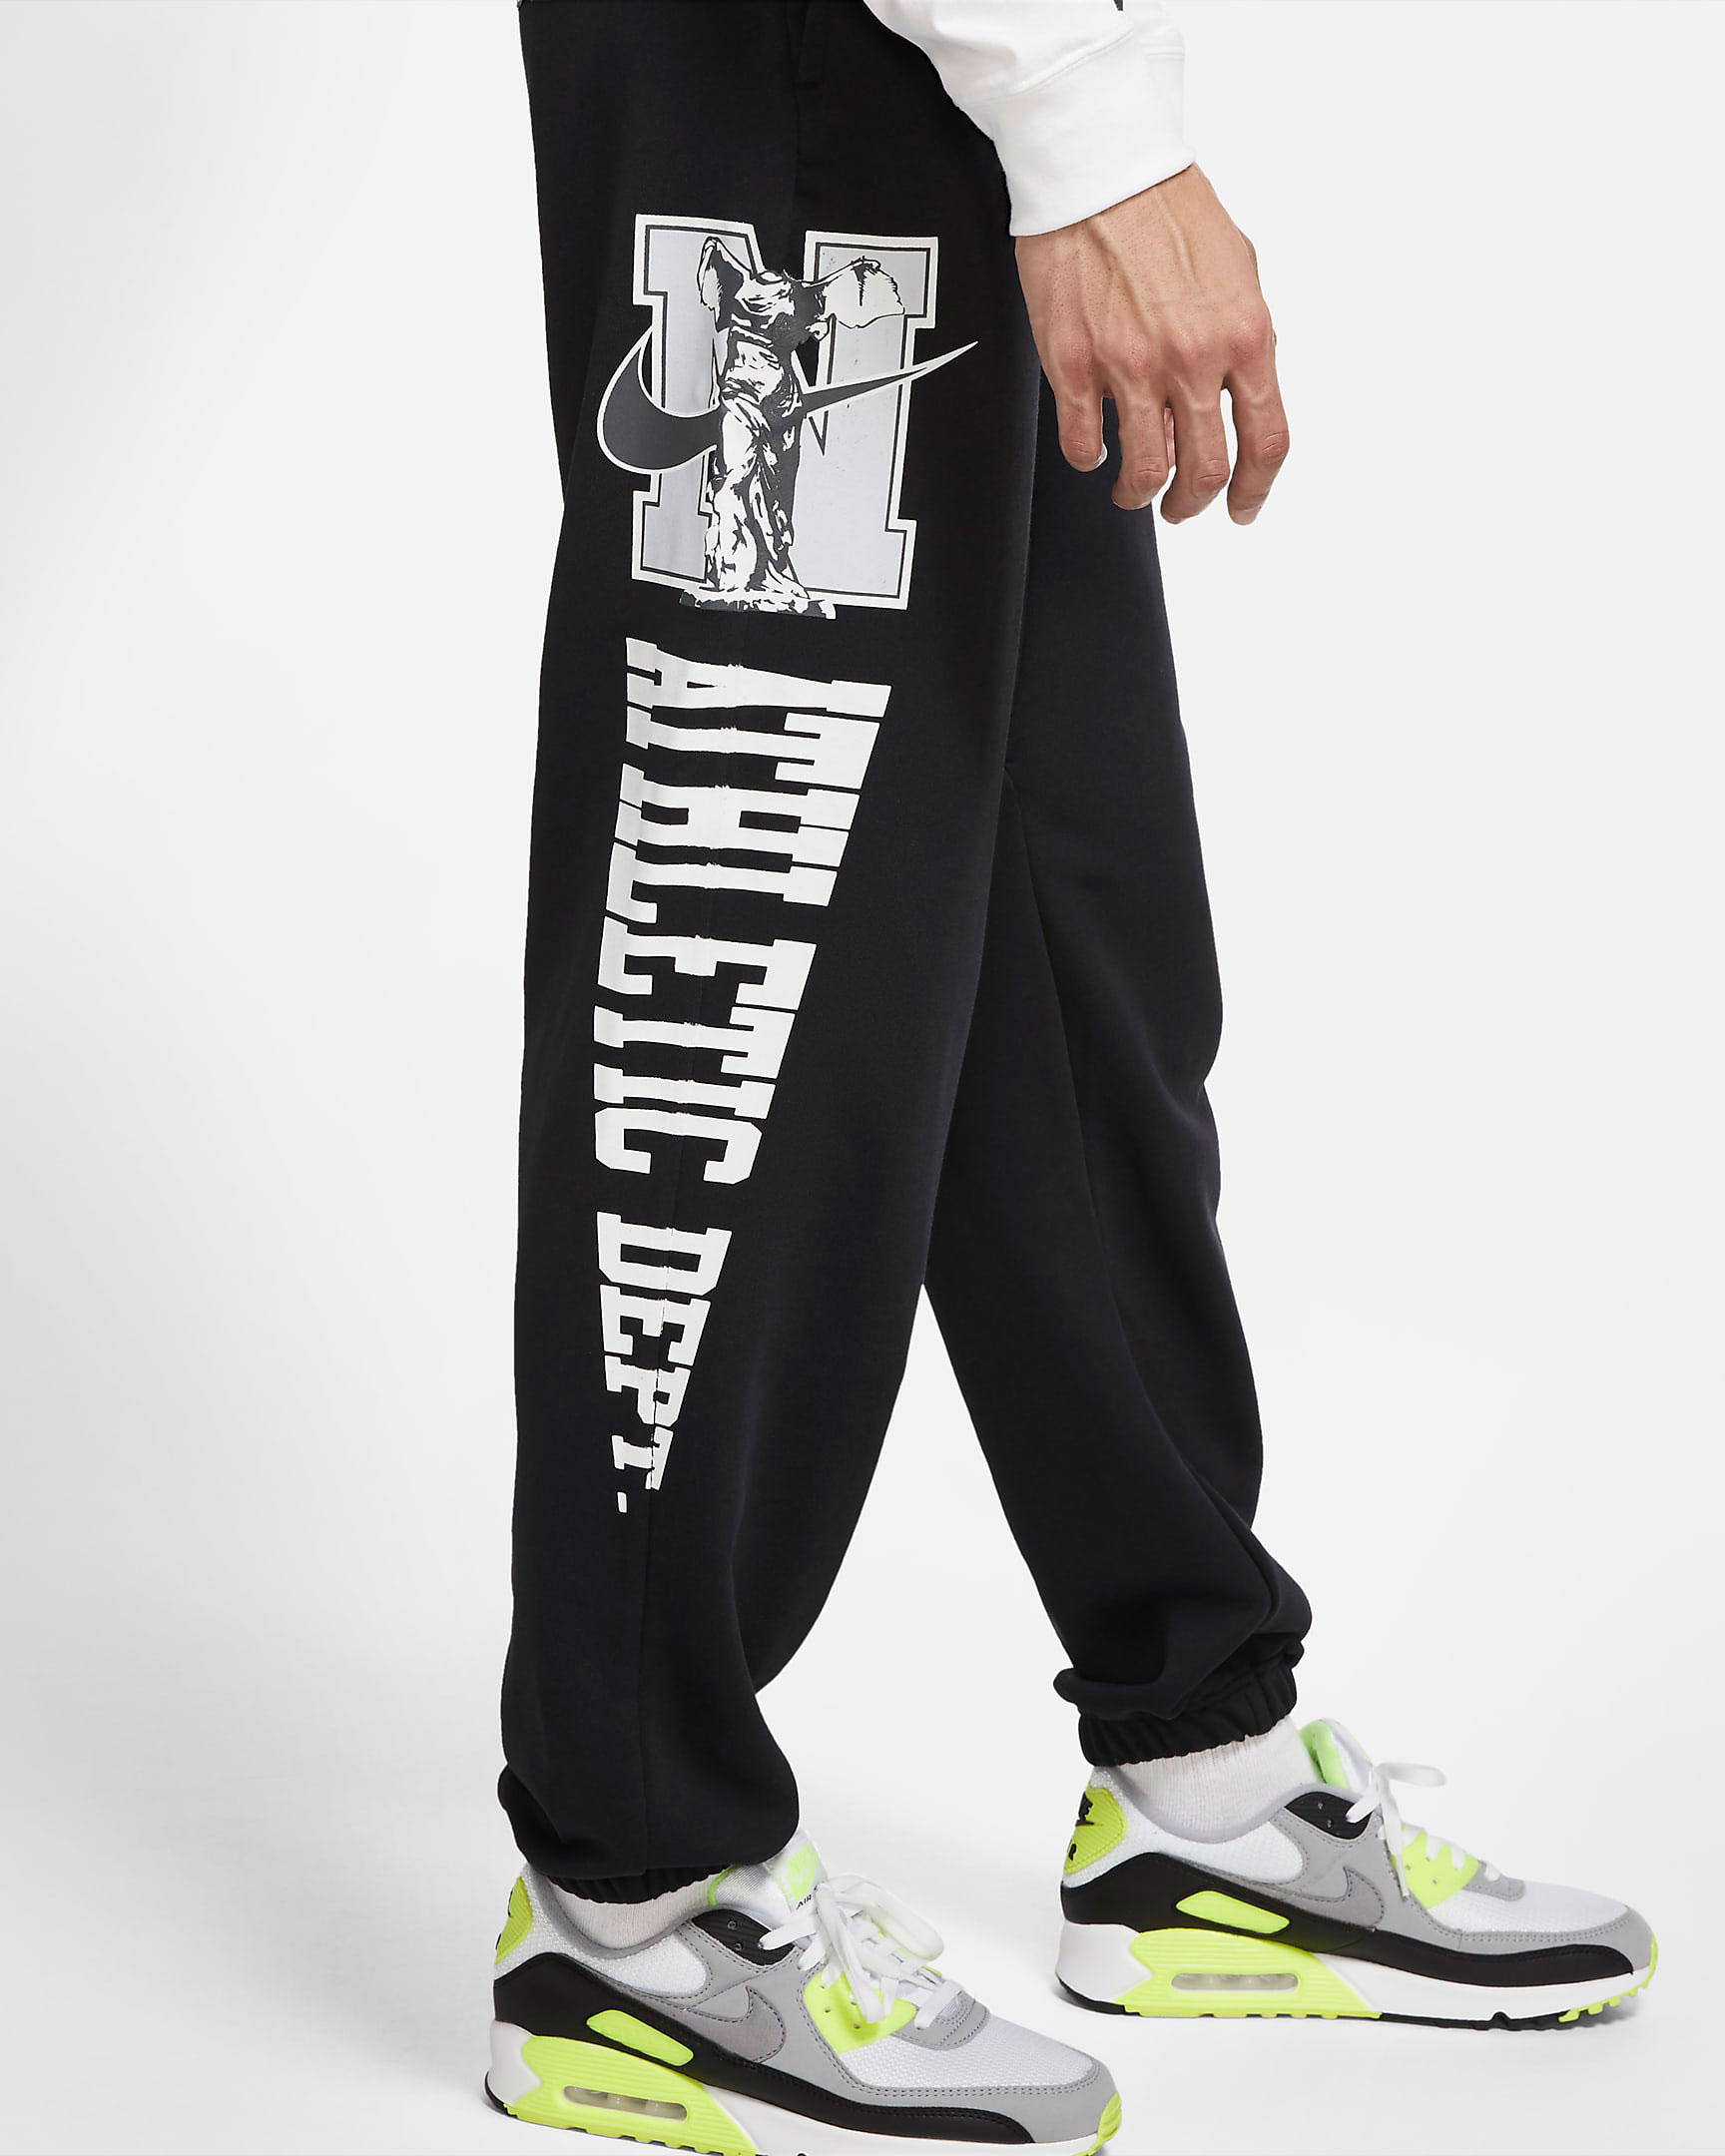 nike-sportswear-class-of-72-jogger-pants-black-volt-1